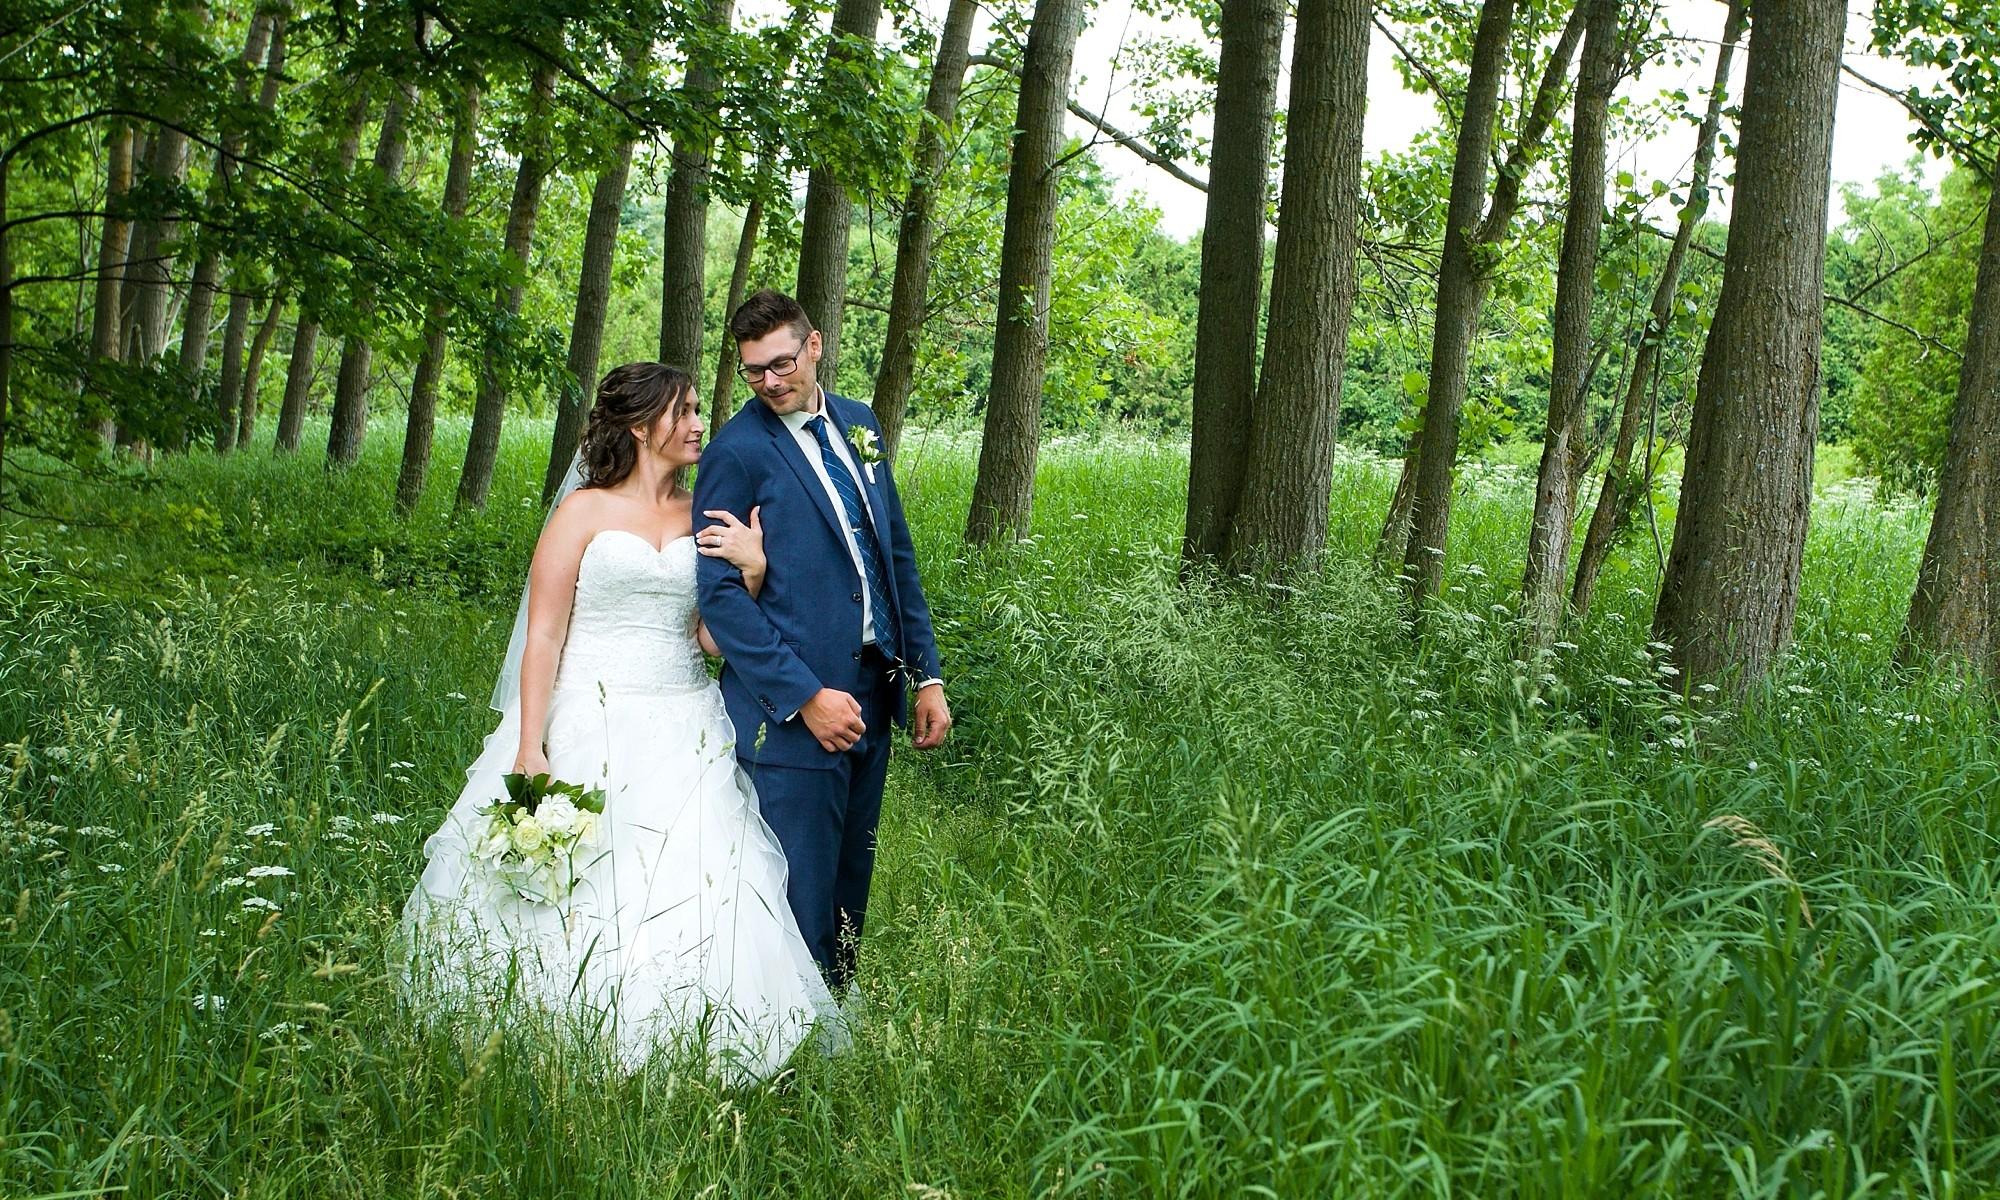 newlywed couple walking in the garden